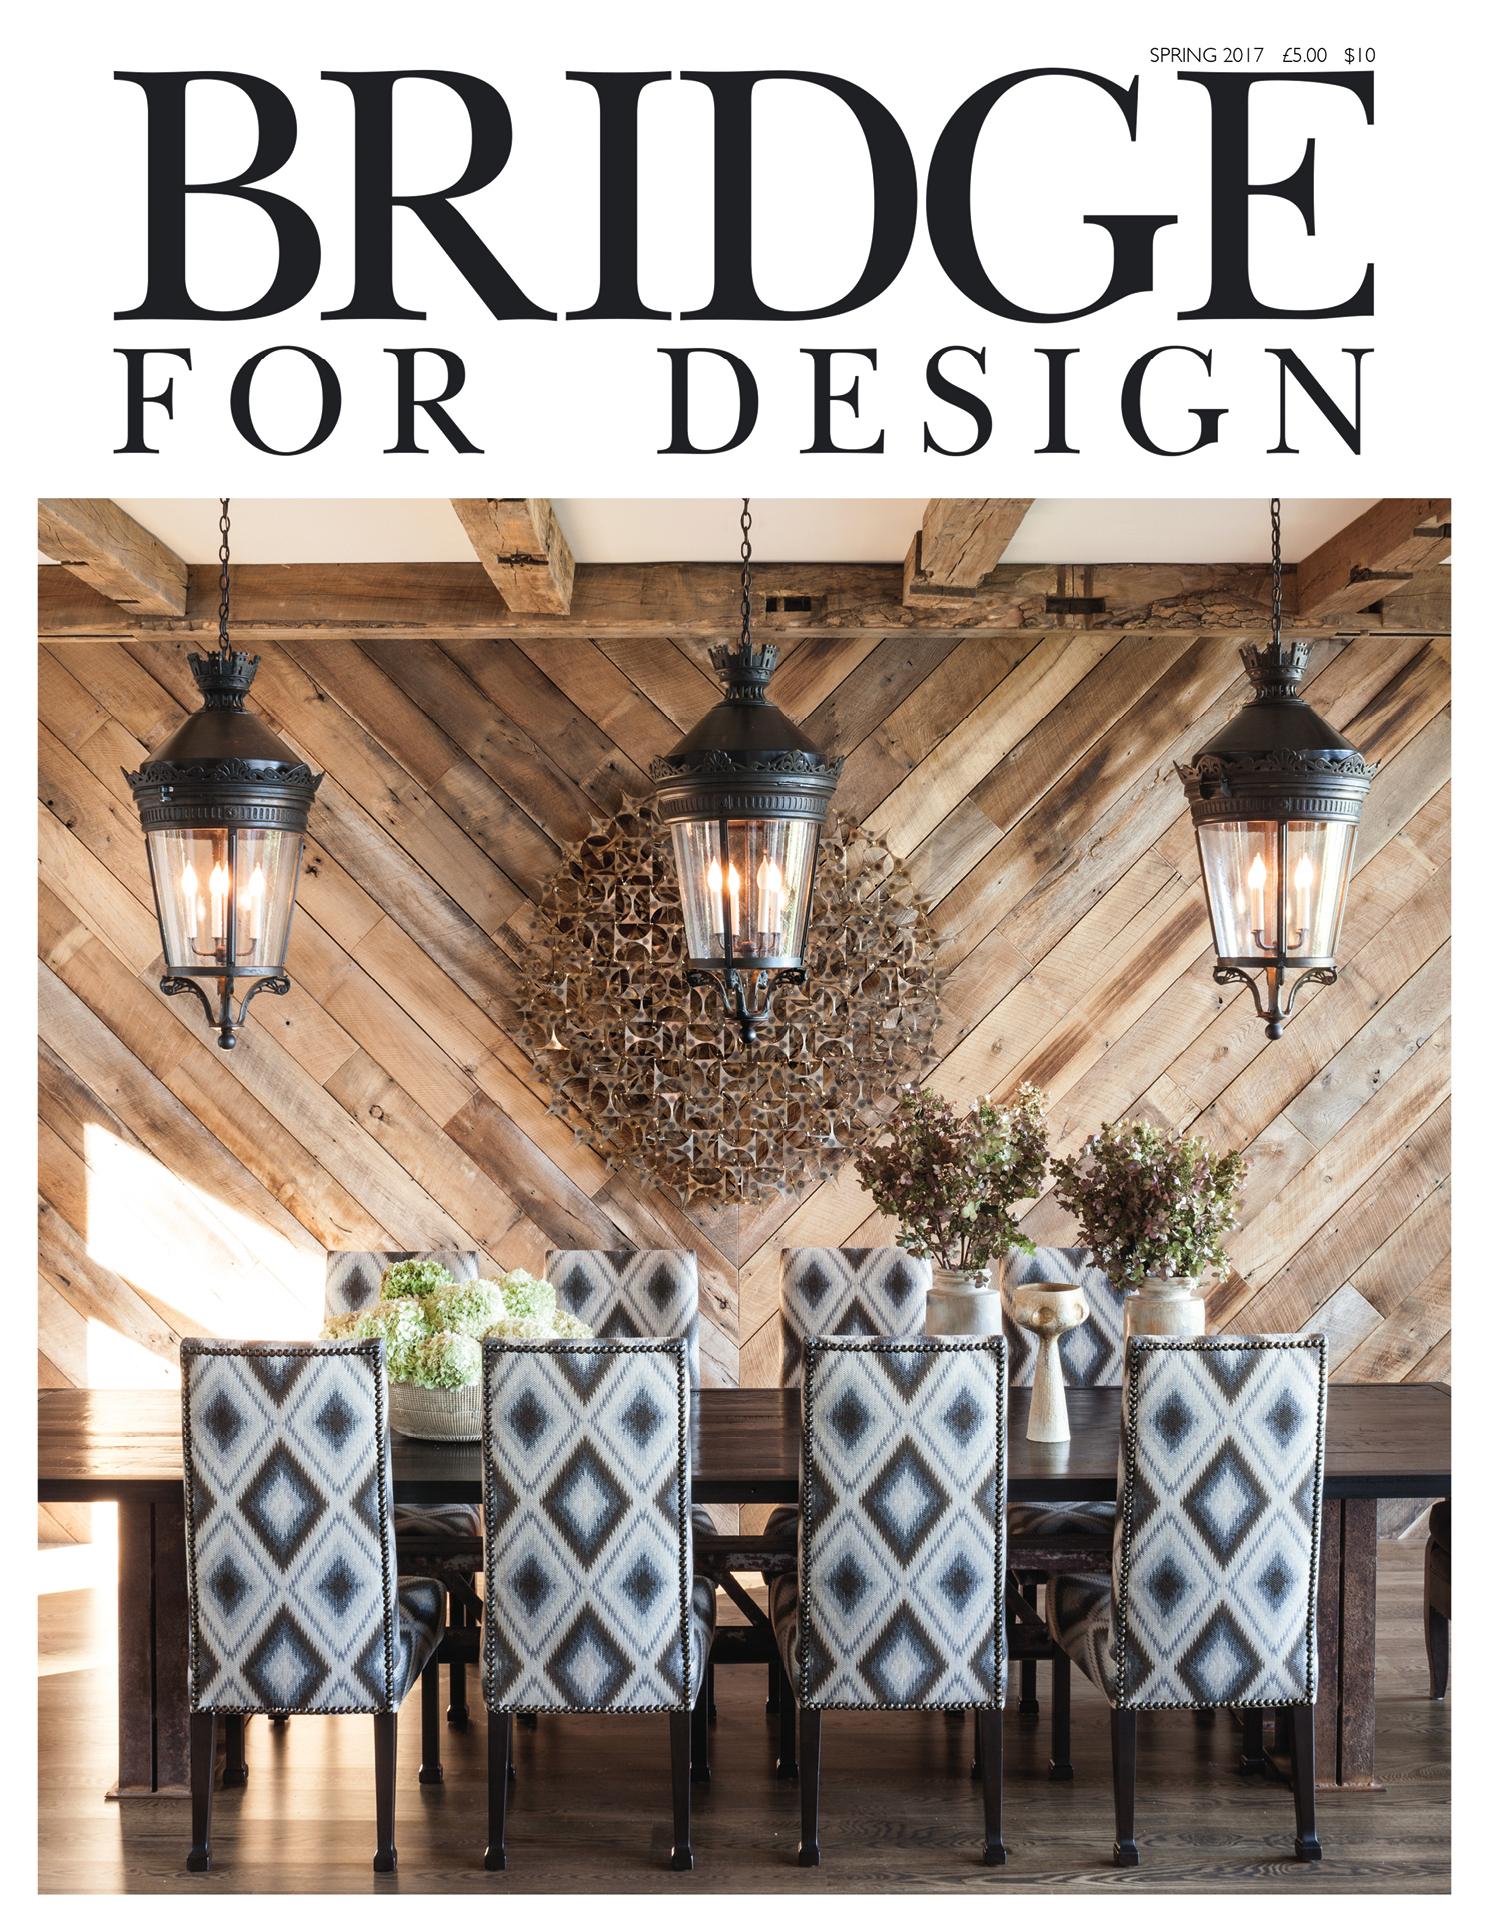 BridgeSpring2017.jpg